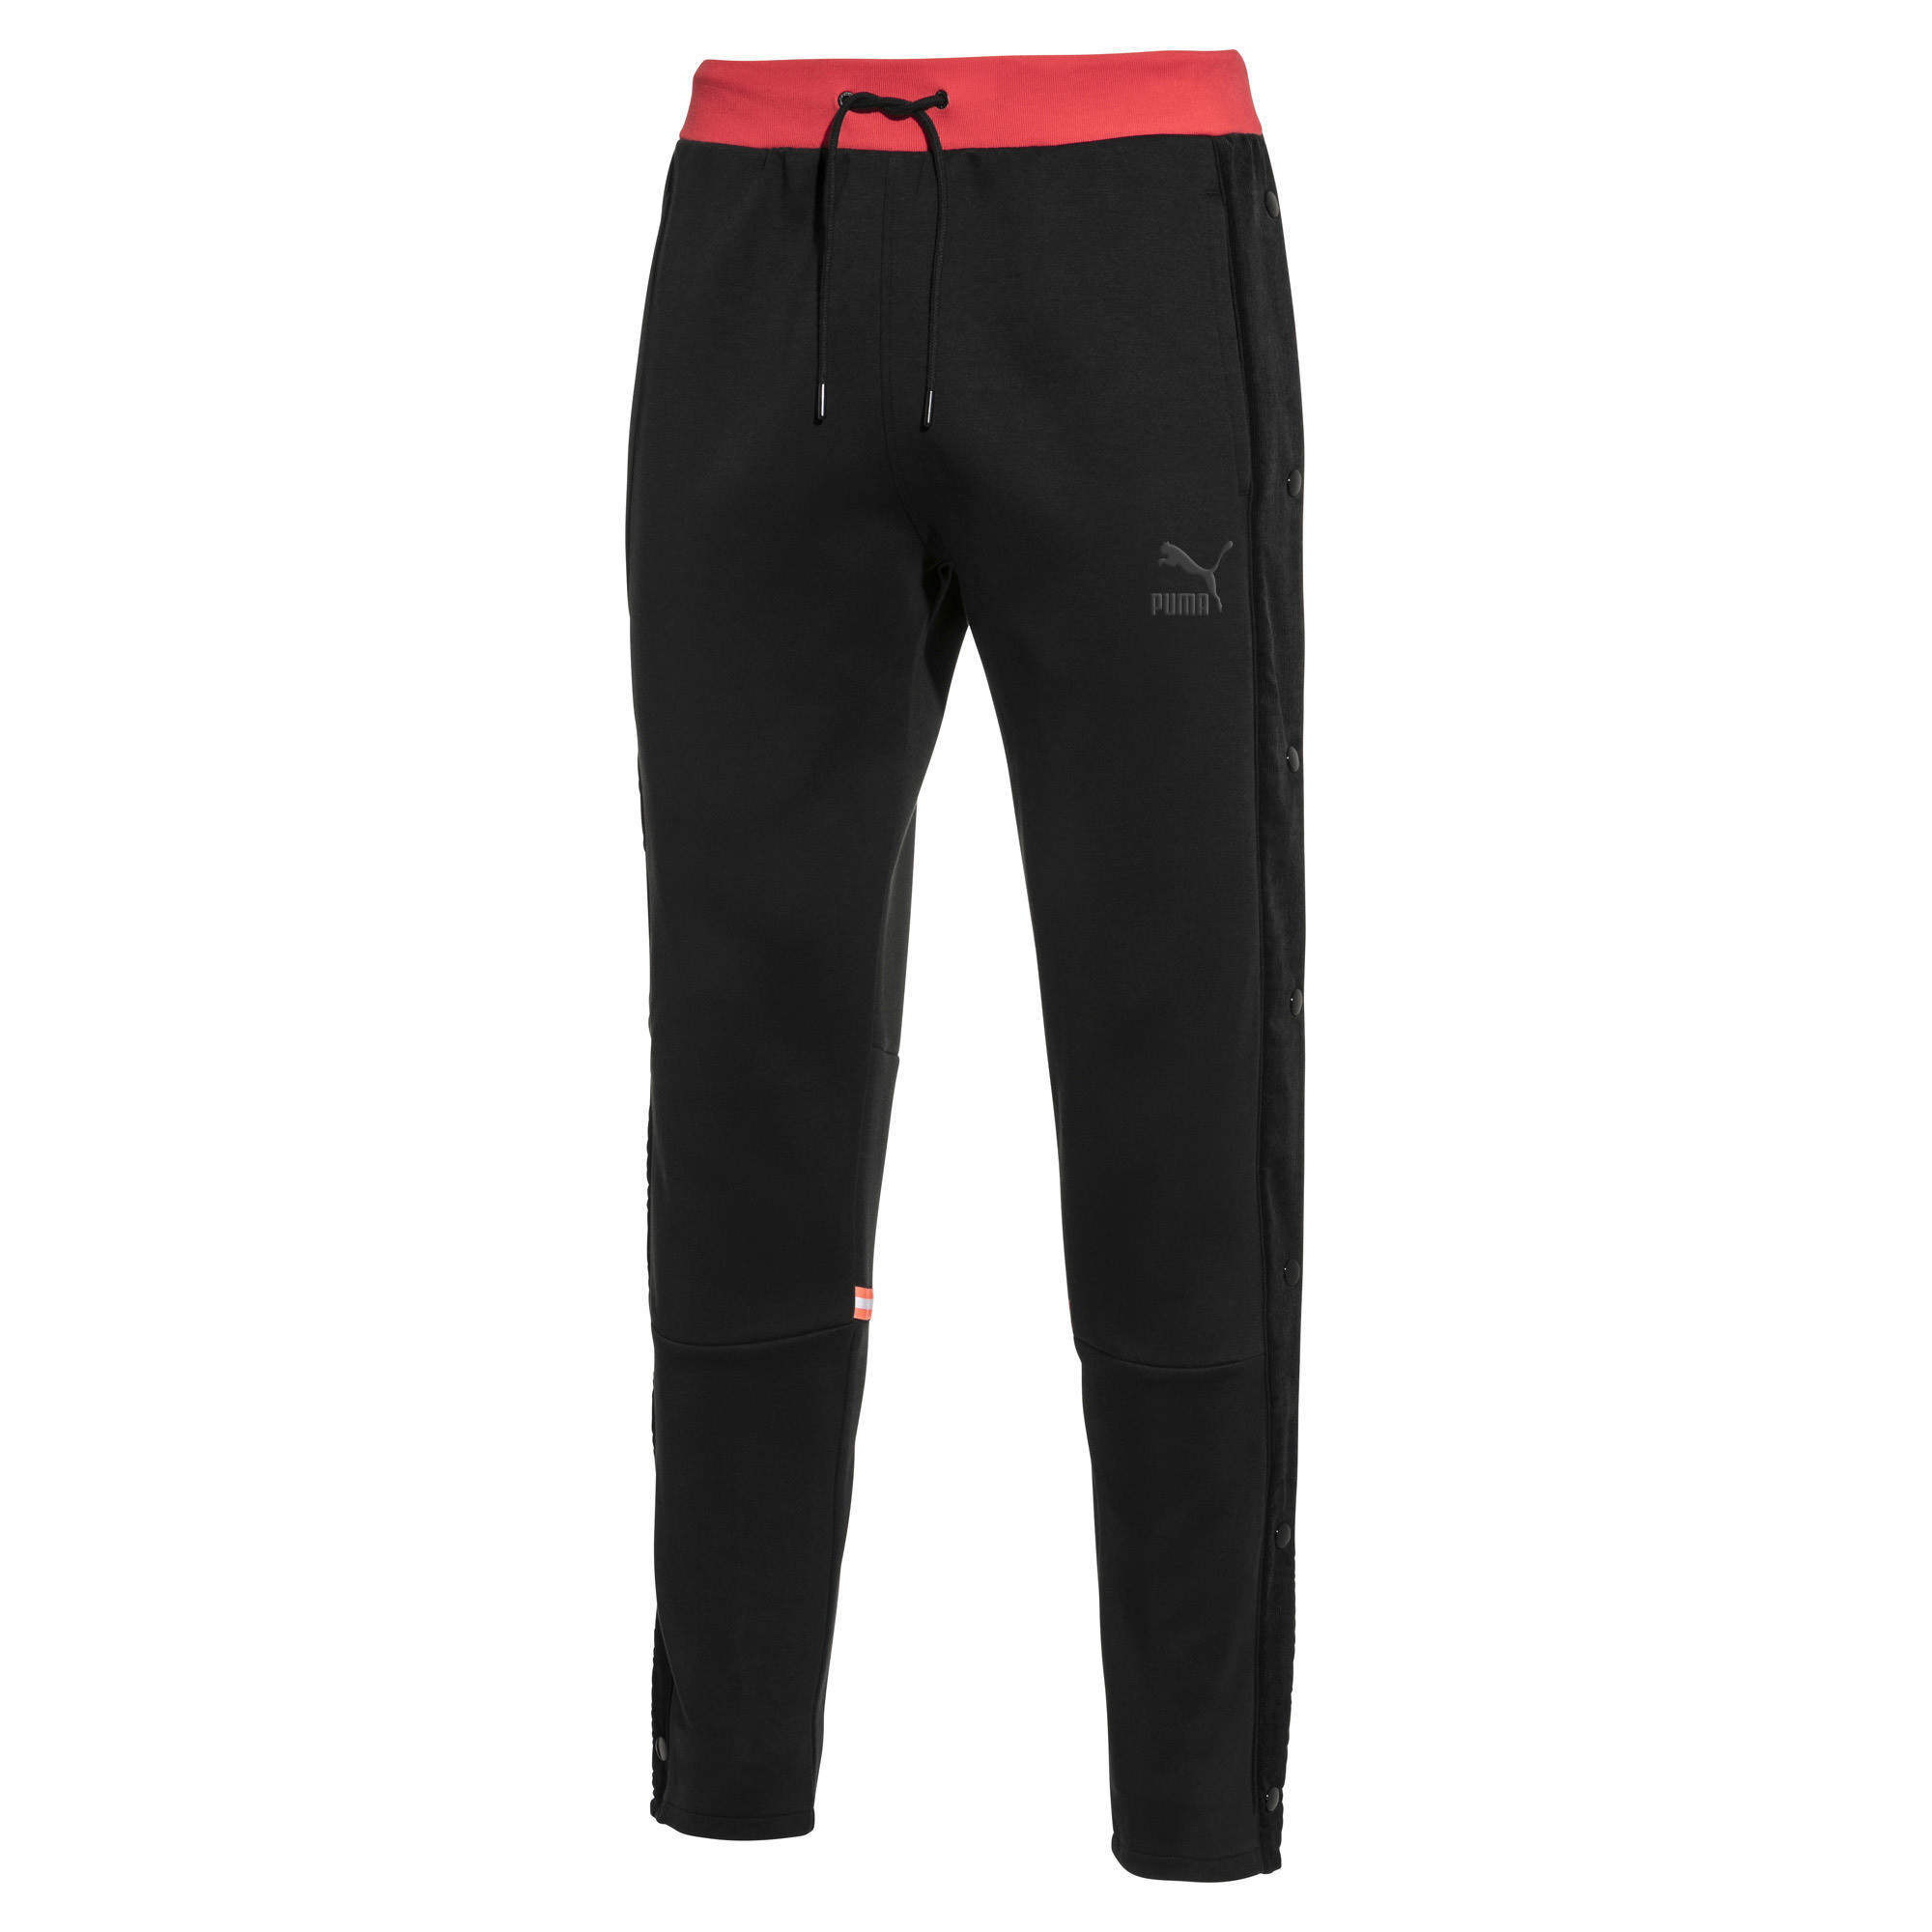 Image Puma PUMA 91074 Men's T7 Track Pants #1